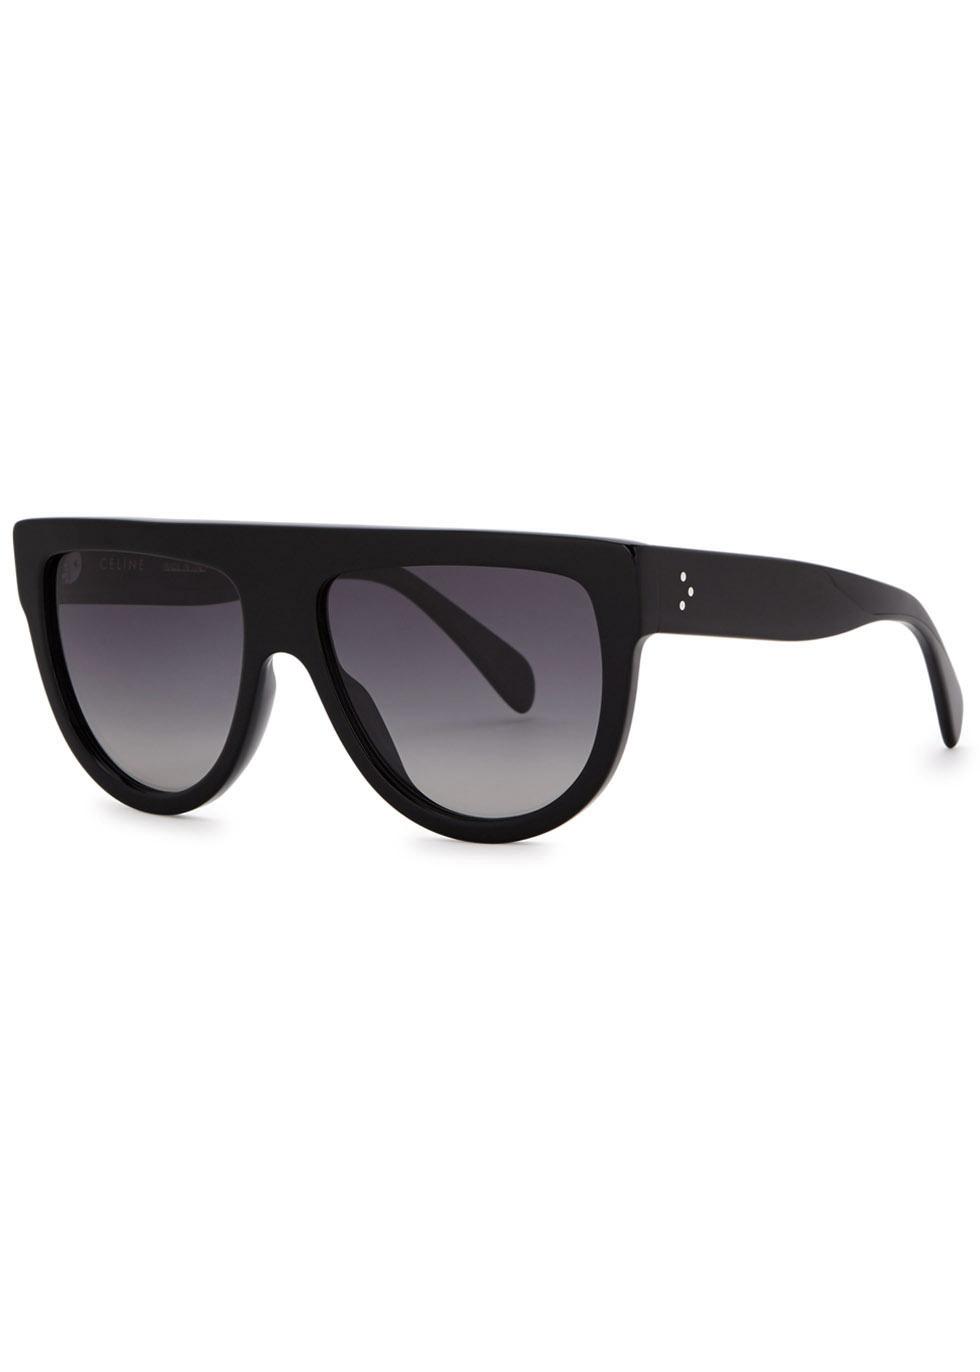 3afac8eba874 Women s Designer Sunglasses and Eyewear - Harvey Nichols